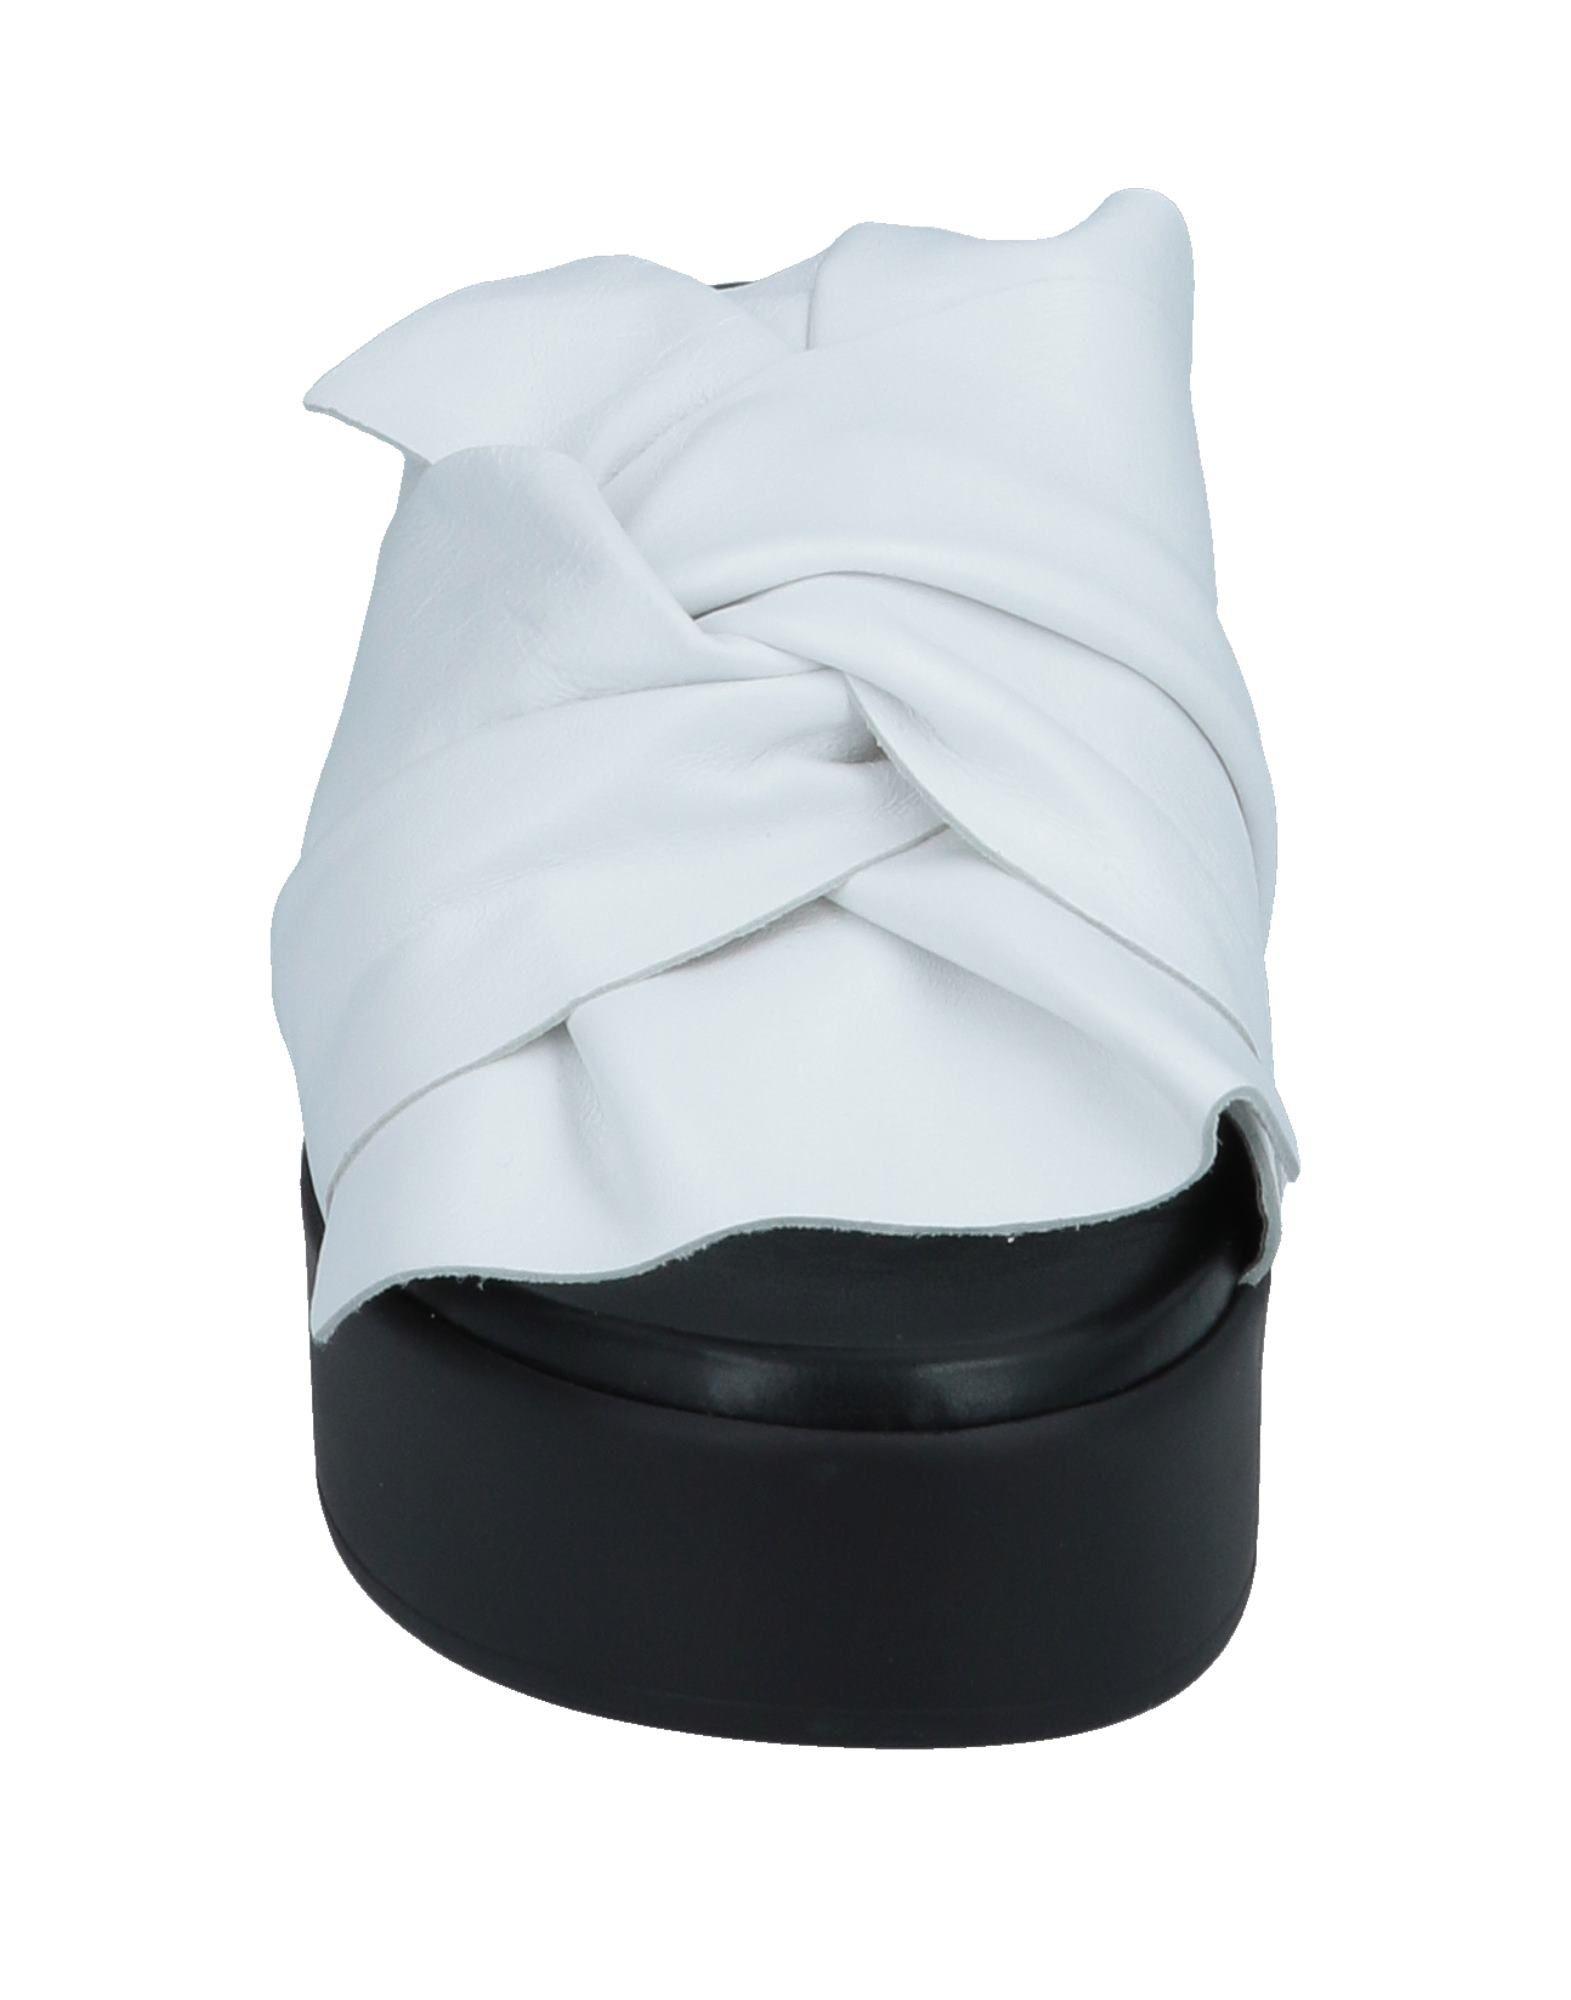 ovye & # 39; par cristina lucchi lucchi lucchi sandales - femmes ovye & # 39; par cristina lucchi sandales en ligne sur canada 56fa82